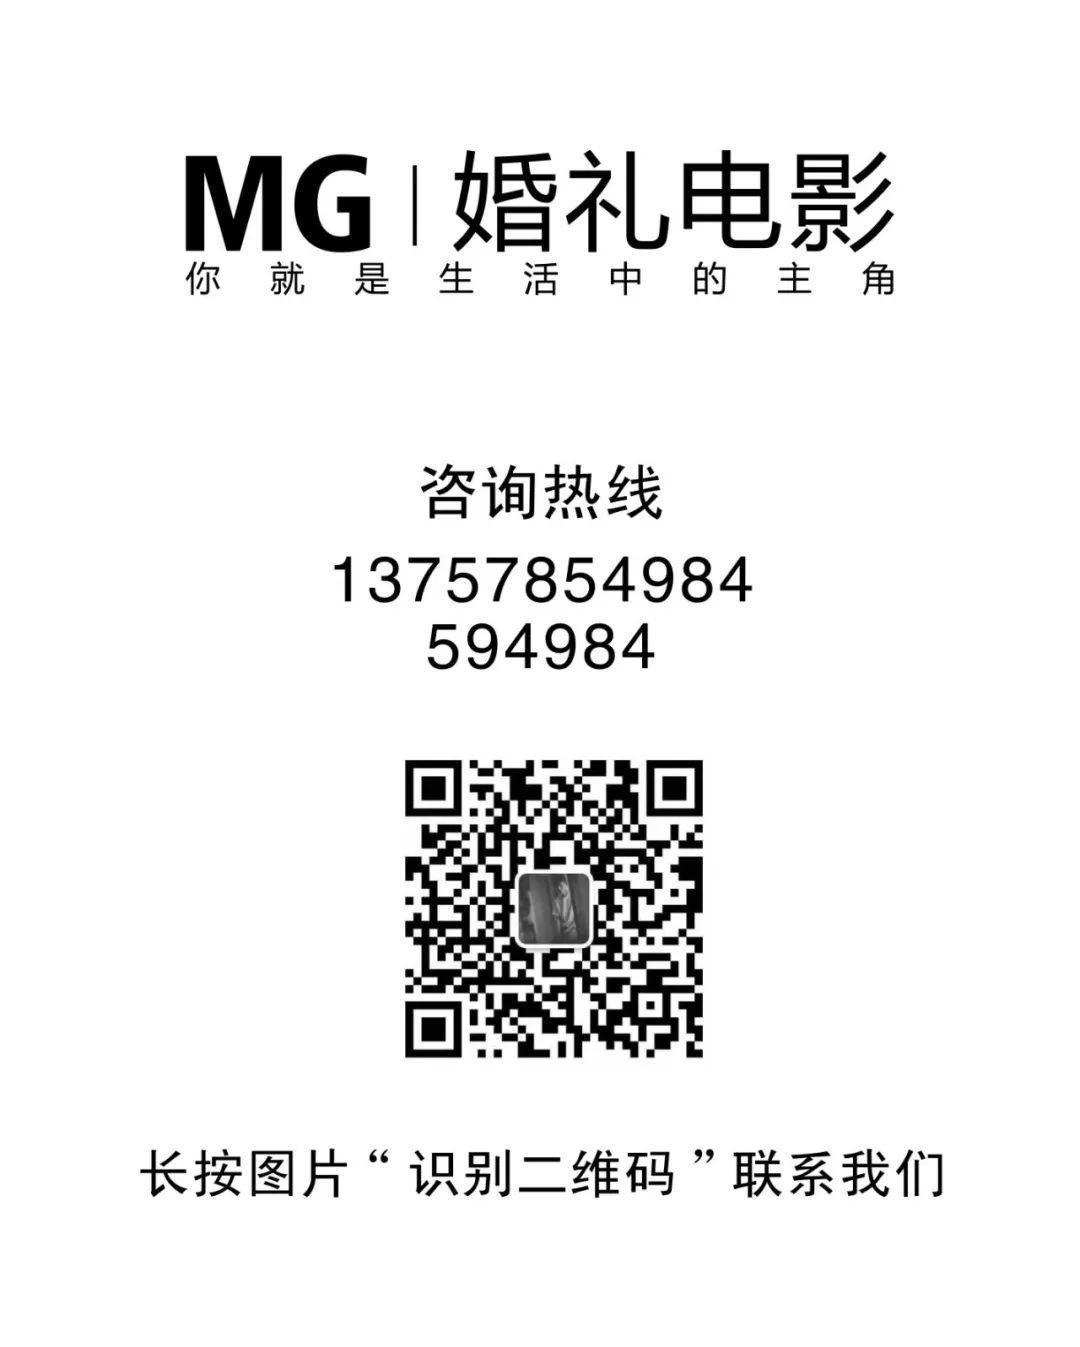 MG STUDIO快剪 【卓越&卢子瑶】1400多天的坚守,终于在今天华丽绽放.....